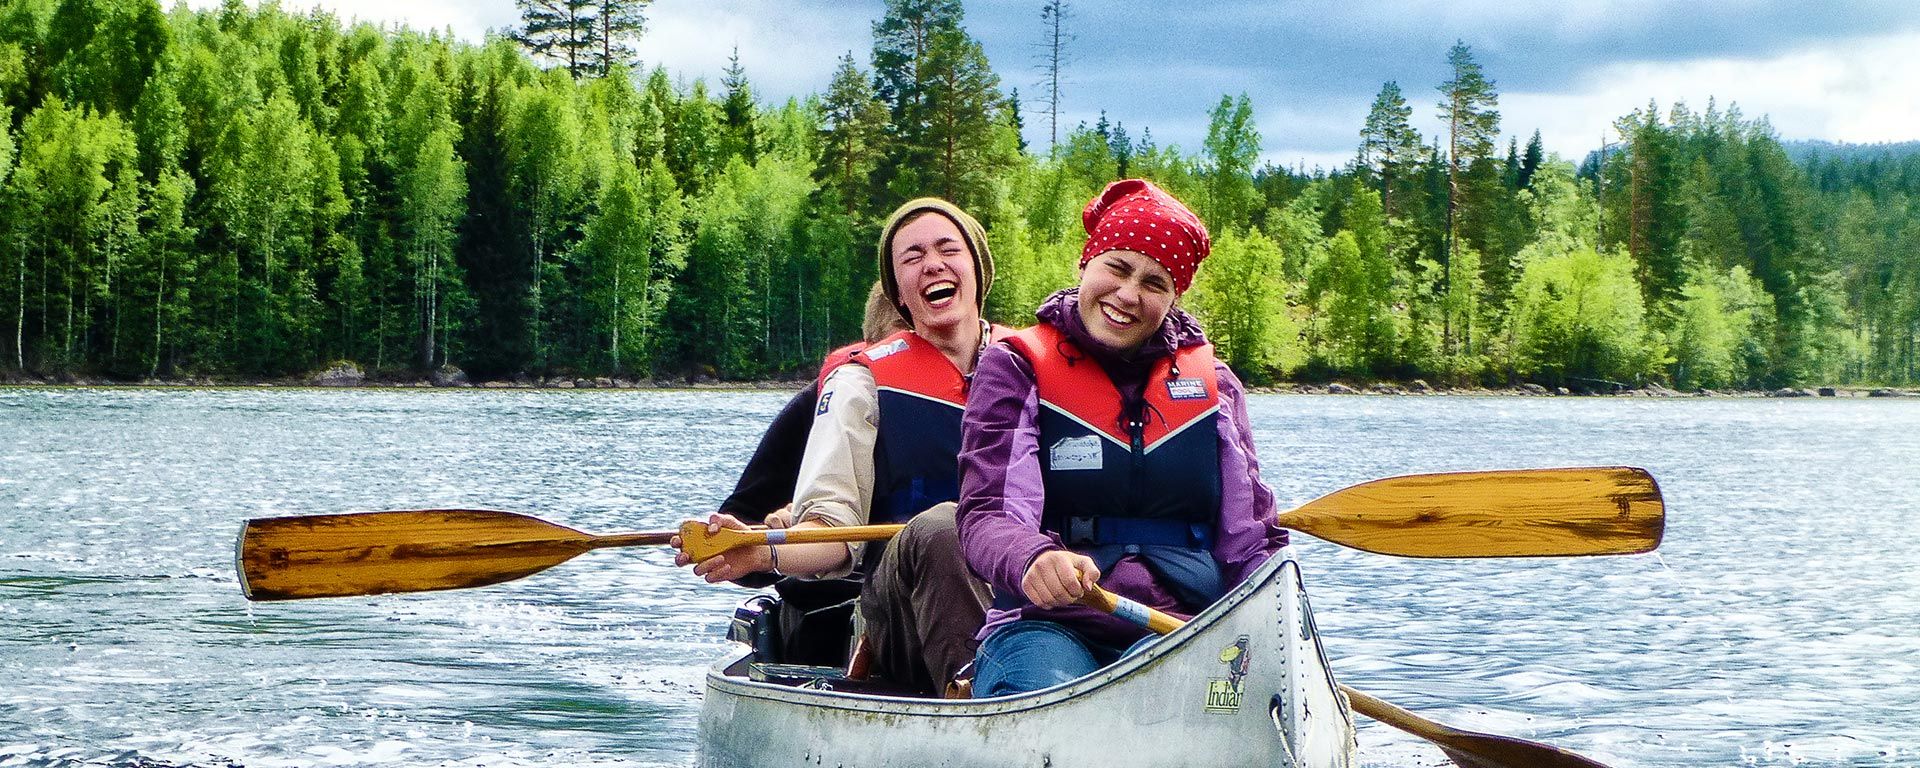 Abenteuer, Natur & Spaß